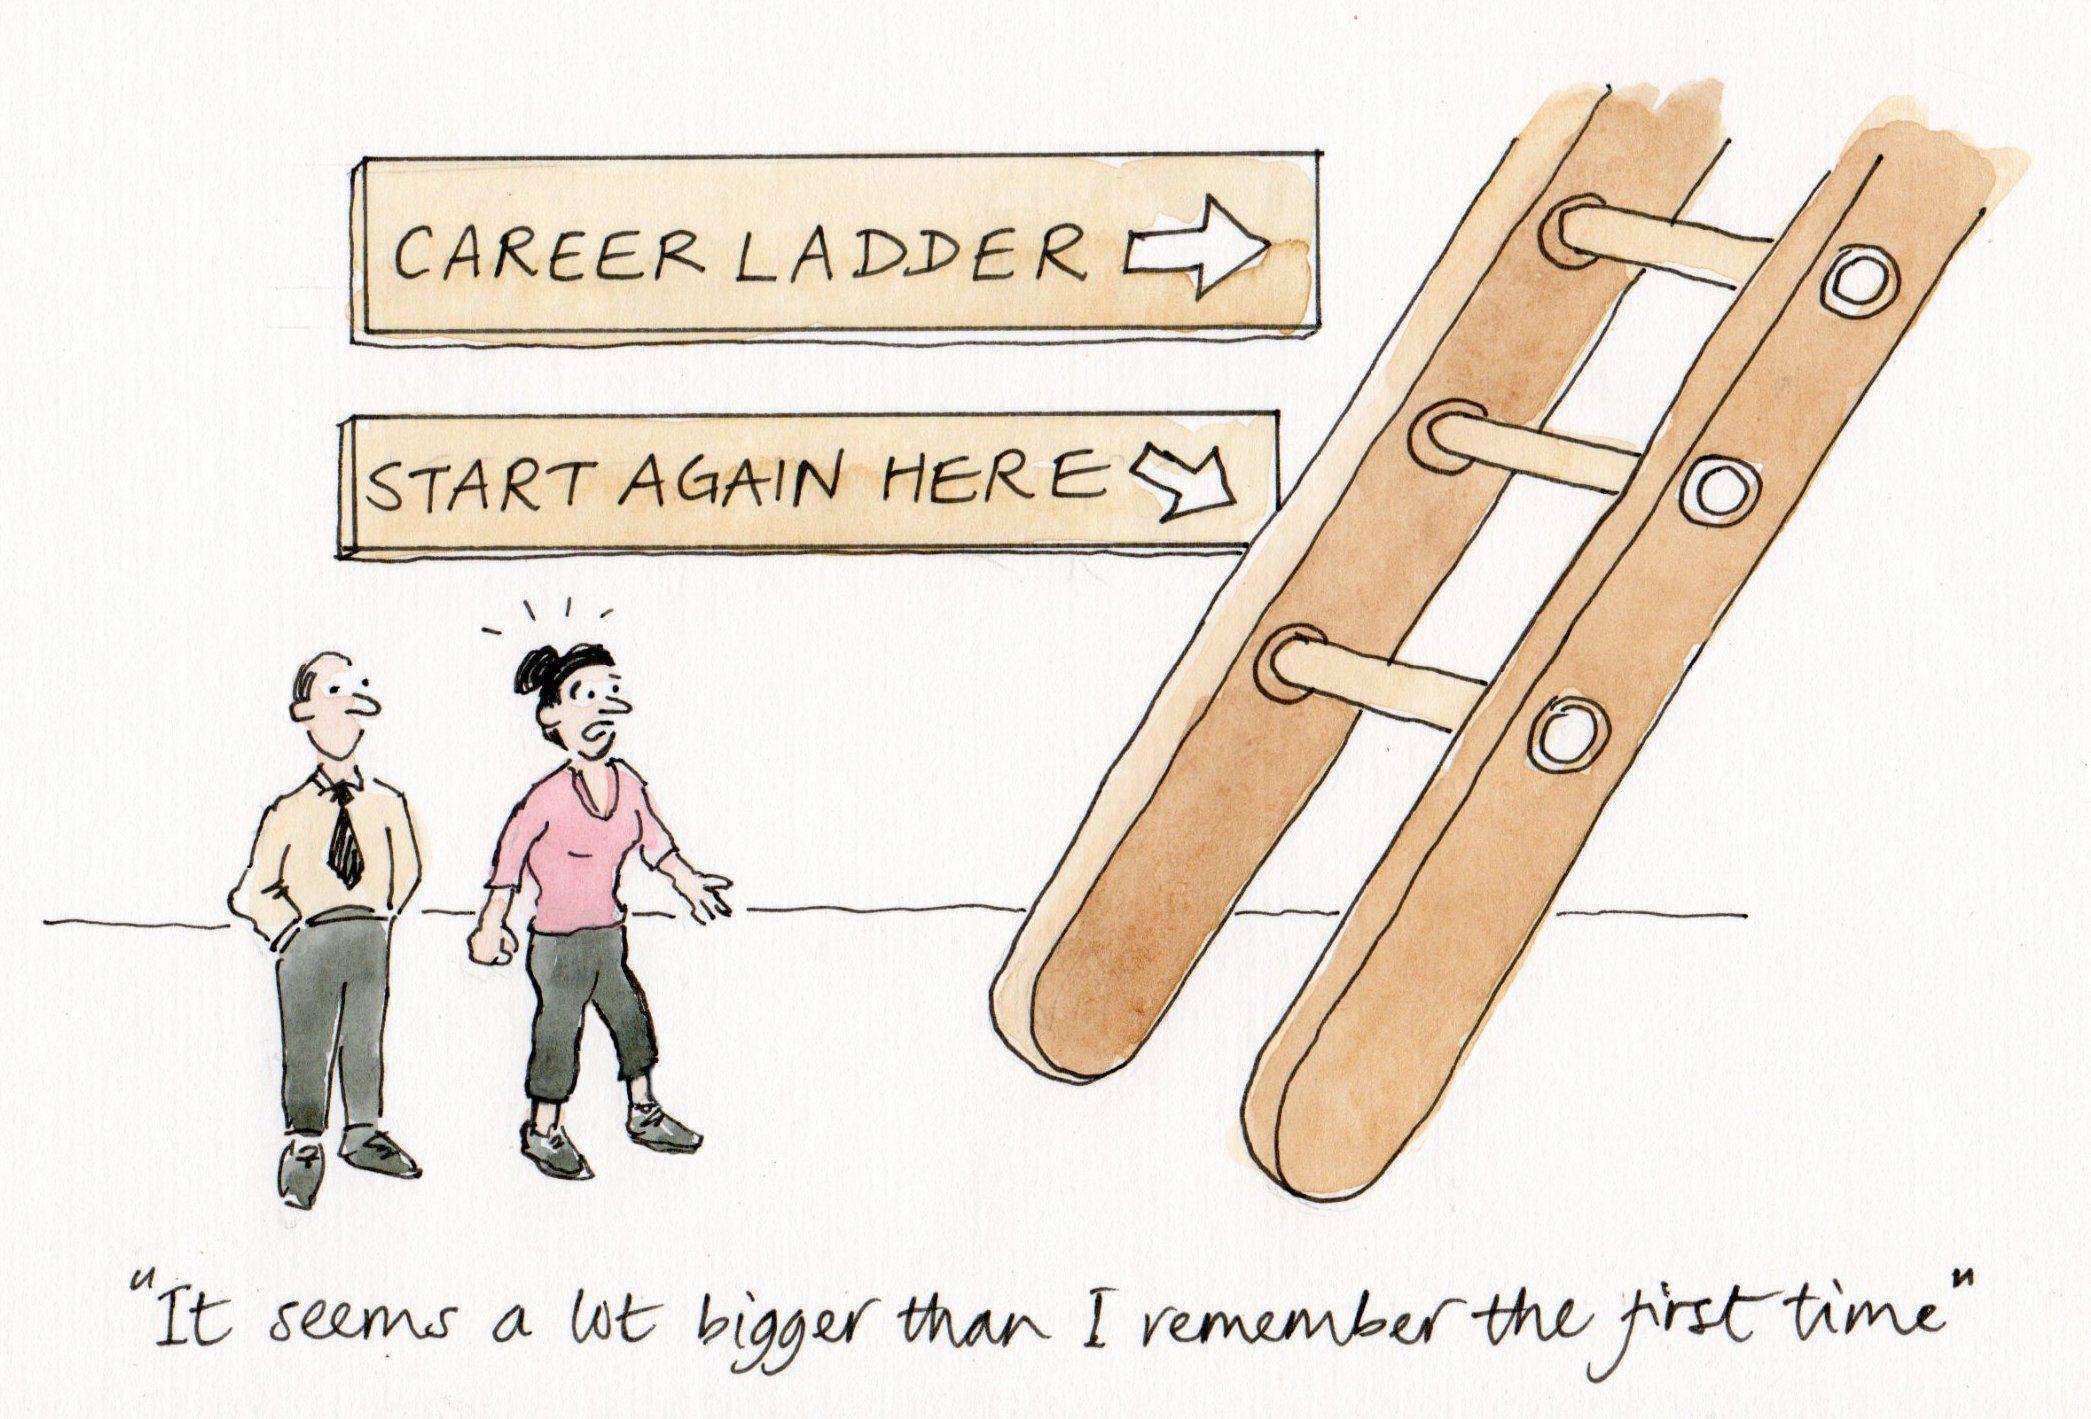 cartoon-14-career-ladder